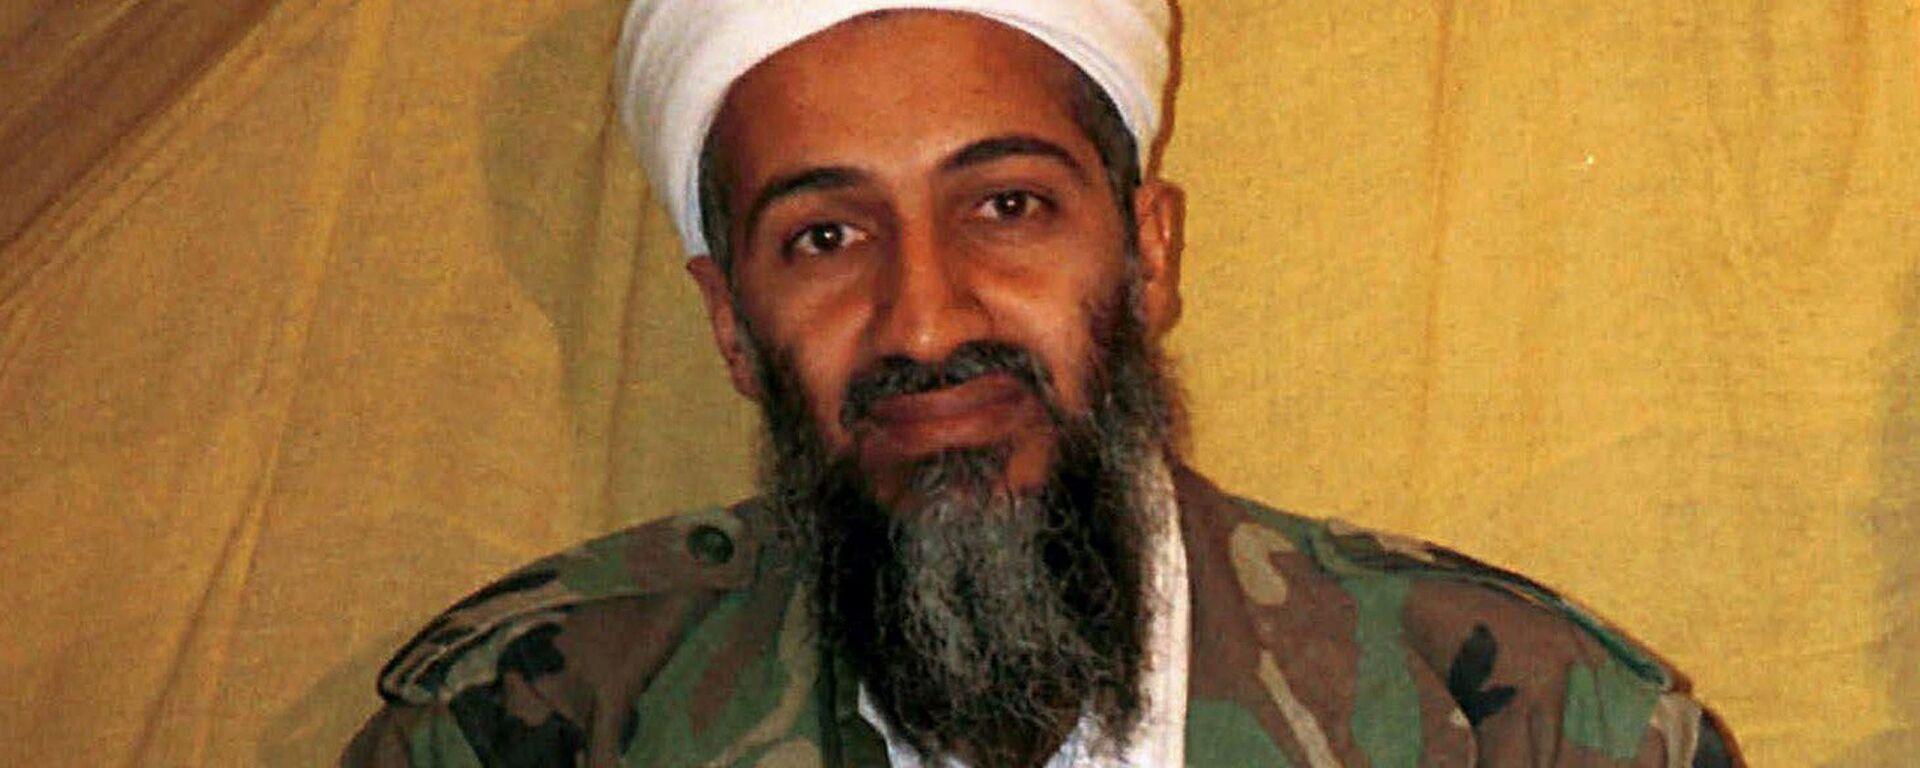 Osama bin Laden, exlíder del grupo terrorista Al Qaeda - Sputnik Mundo, 1920, 02.08.2021